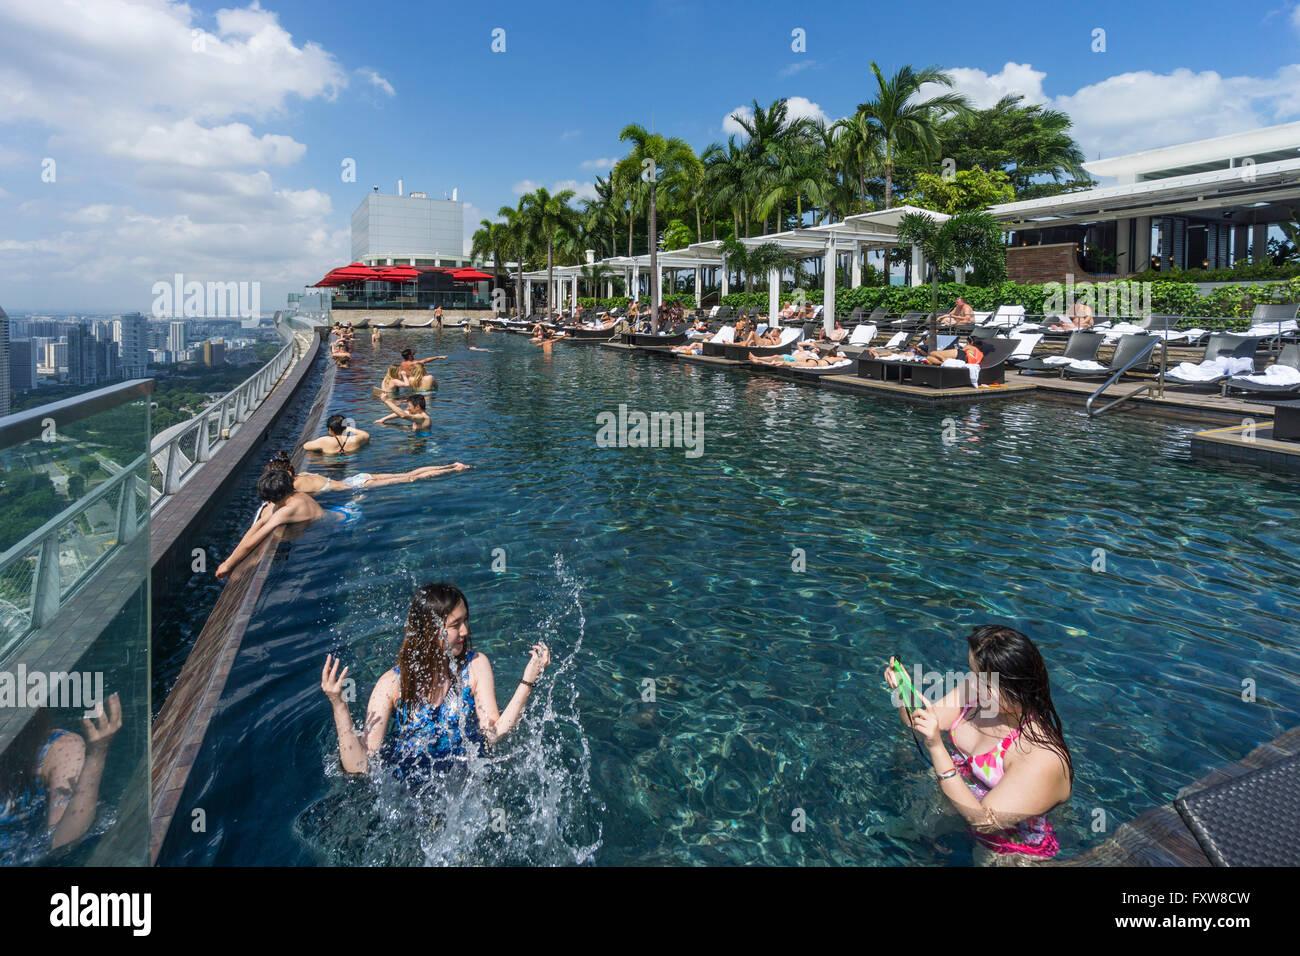 Marina bay sands piscine d bordement terrasse de toit marina bay singapour singapour - Ingresso piscina marina bay sands ...